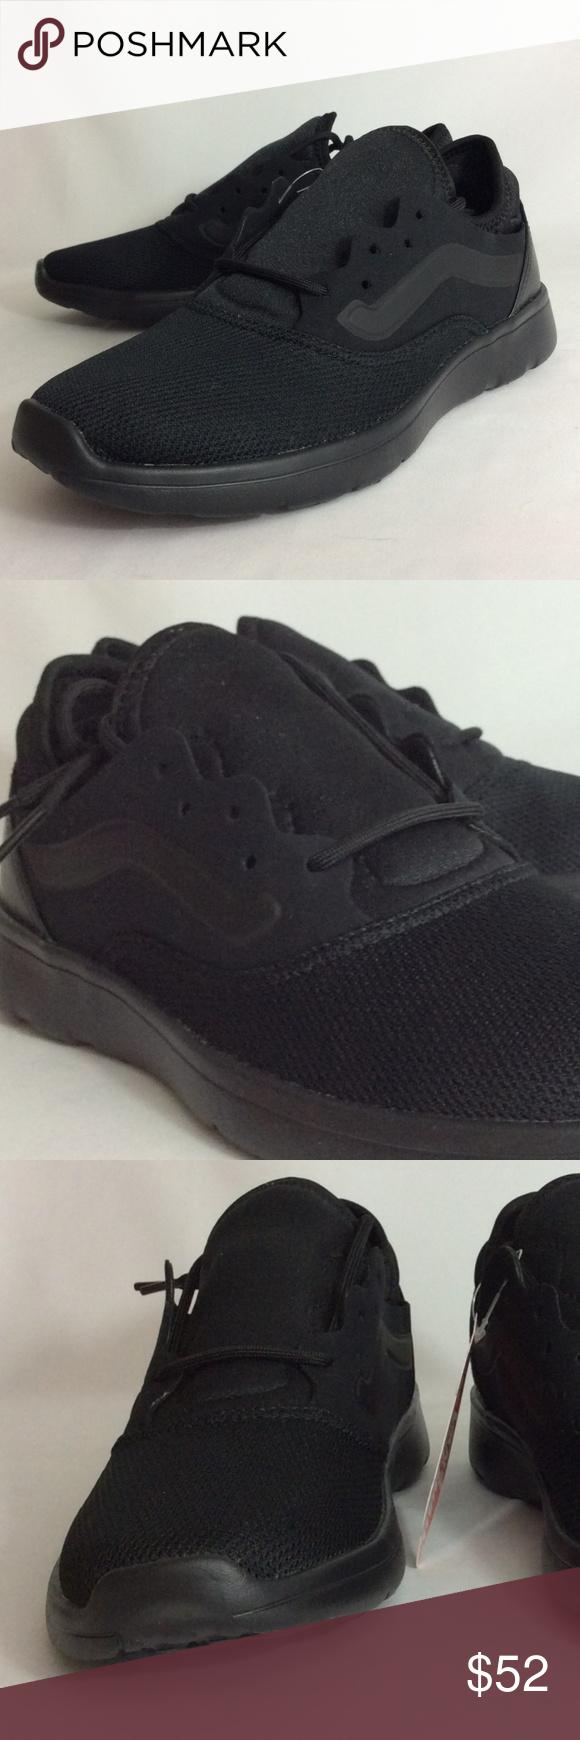 vans staple iso route mens shoes